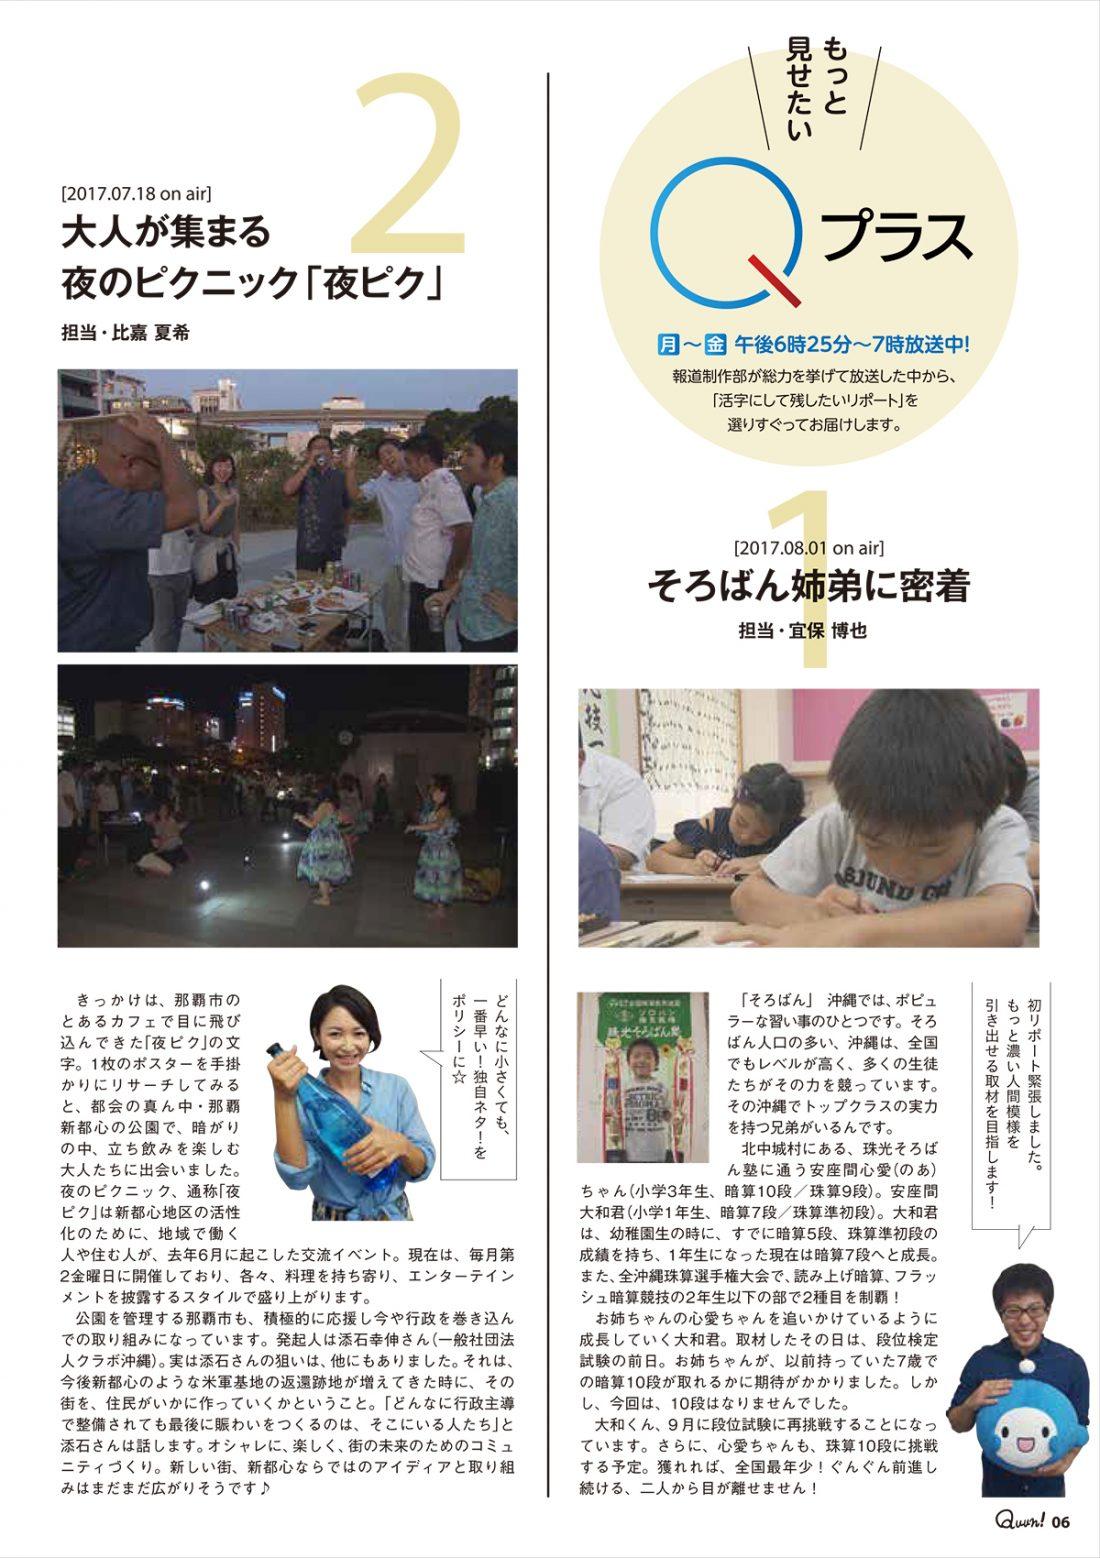 http://www.qab.co.jp/qgoro/wp-content/uploads/quun_0808-1100x1558.jpg